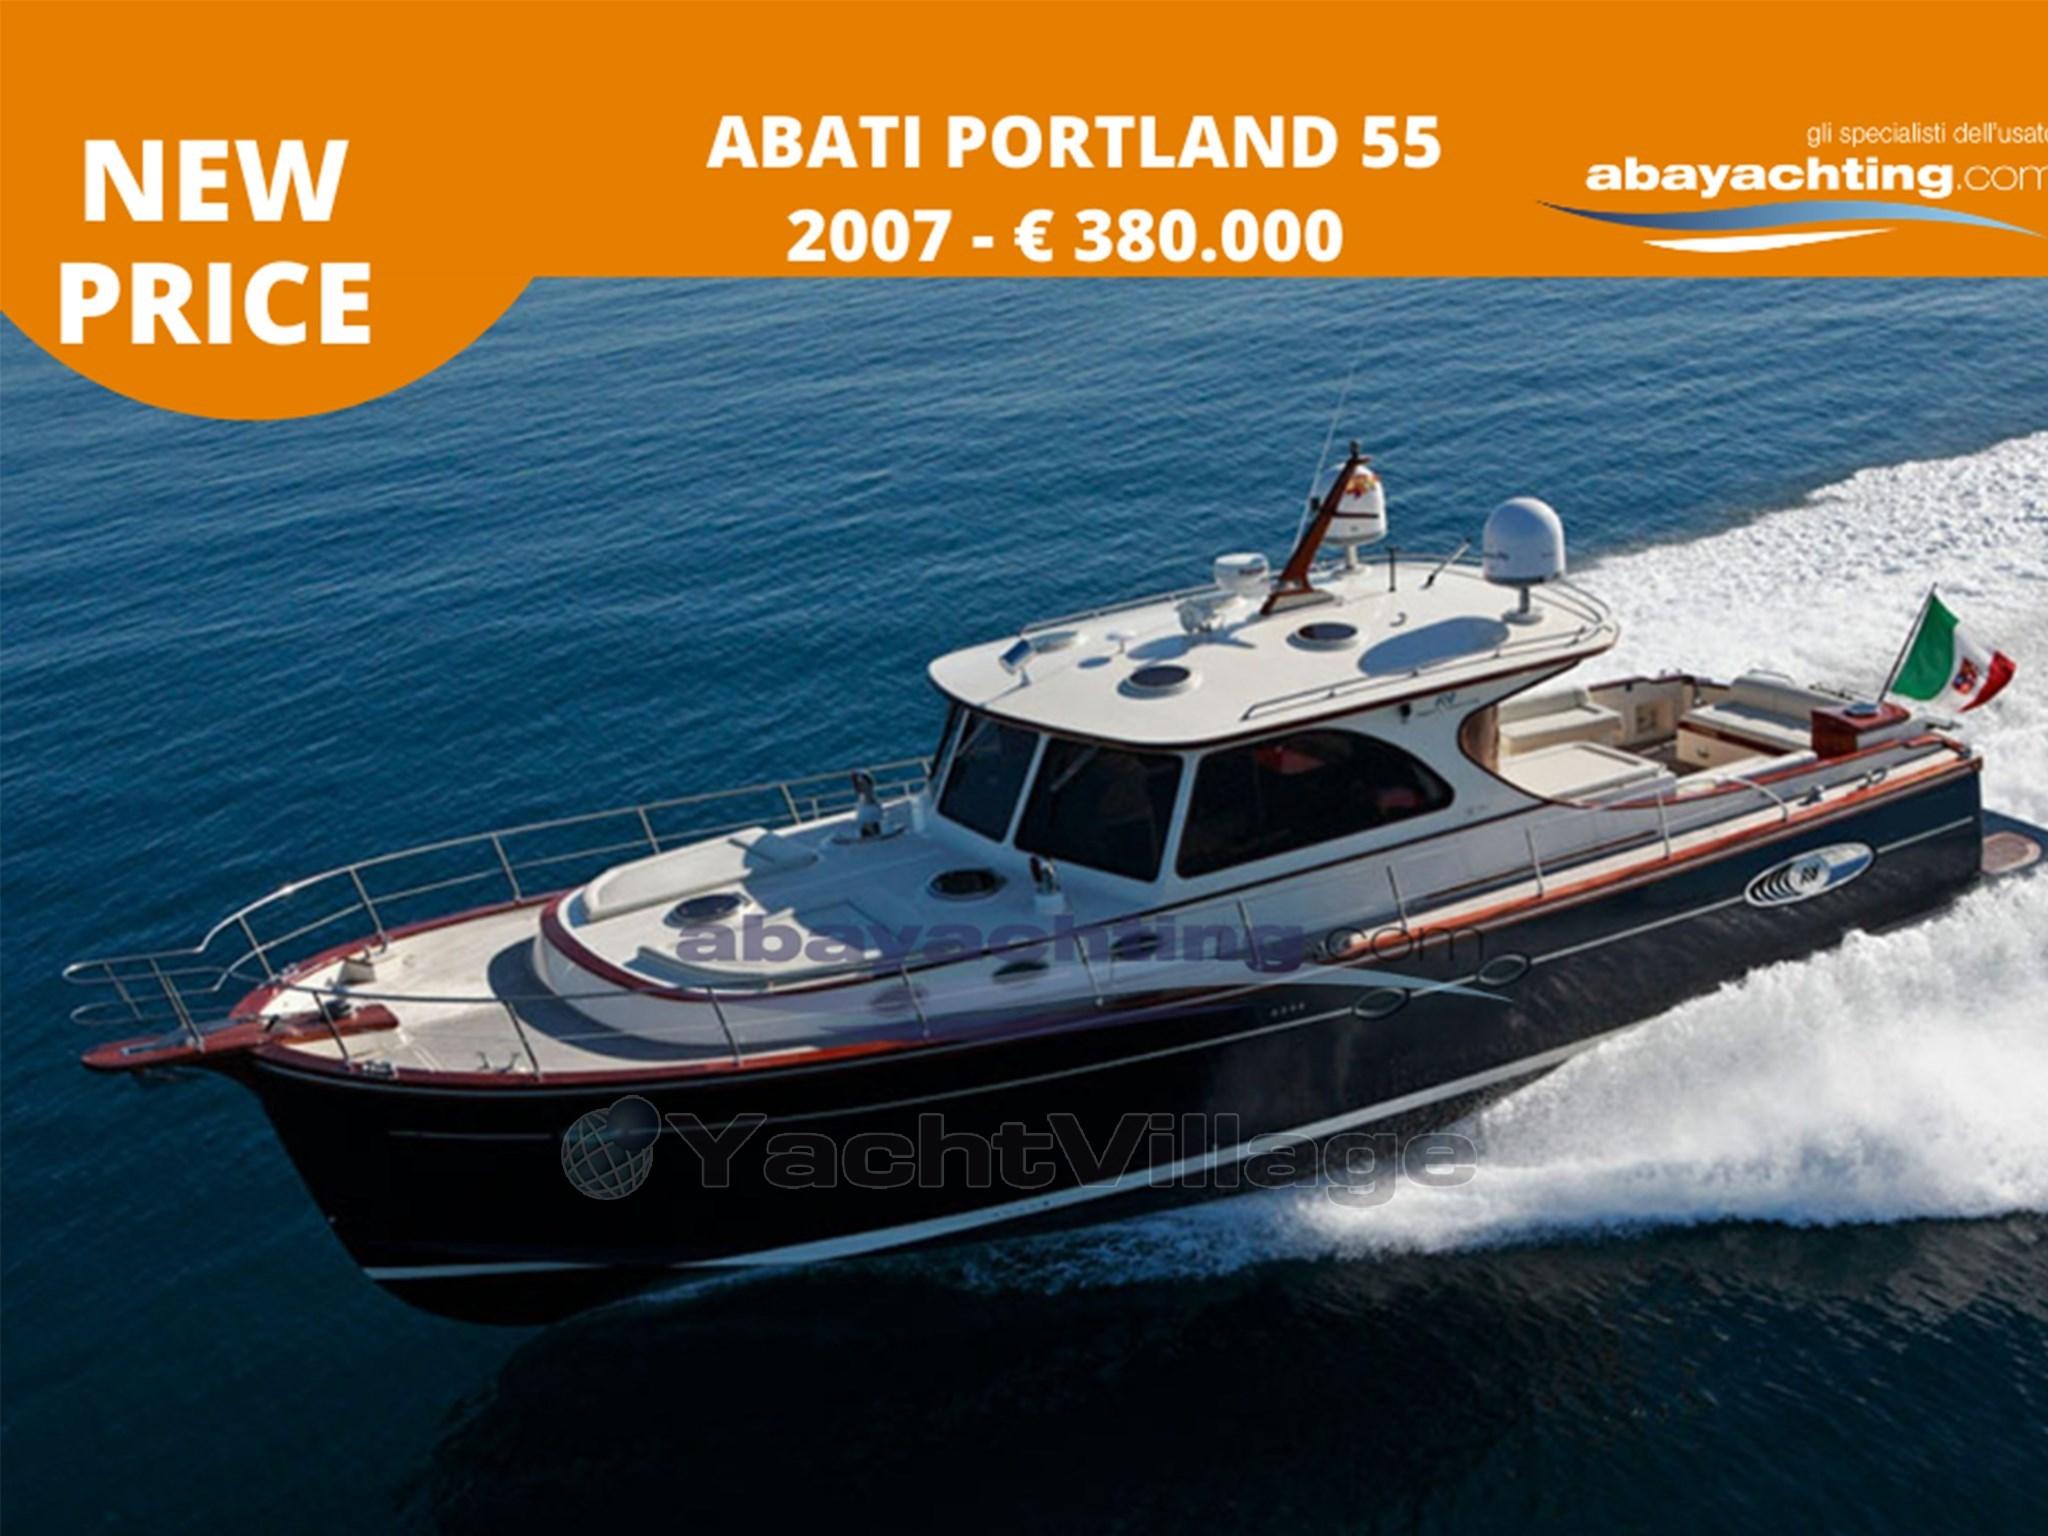 Abayachting Nuovo prezzo Portland 55